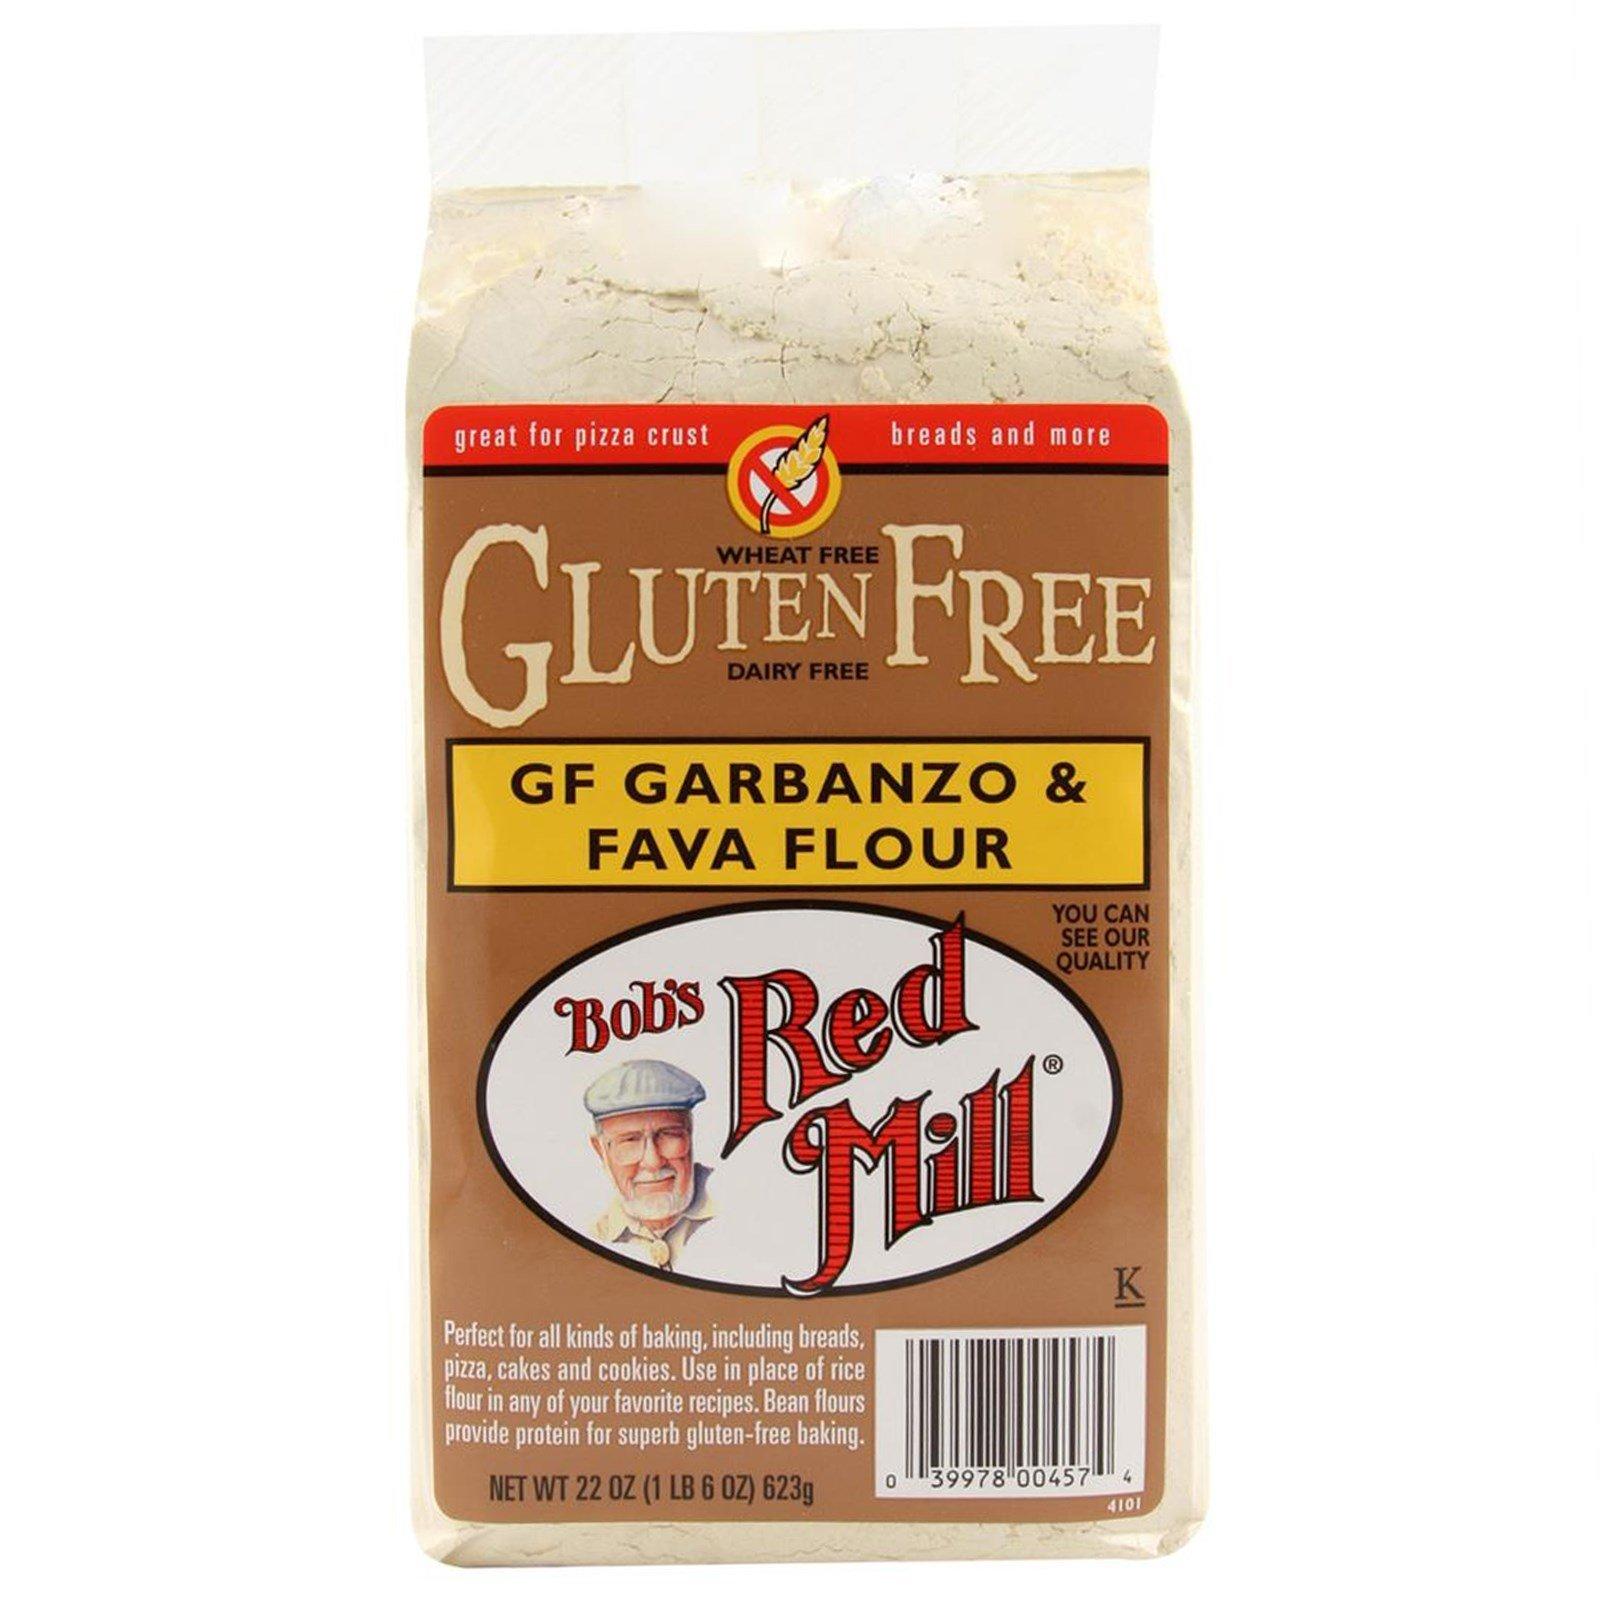 Bob's Red Mill, Garbanzo & Fava Flour, Gluten Free, 22 oz(Pack of 1)